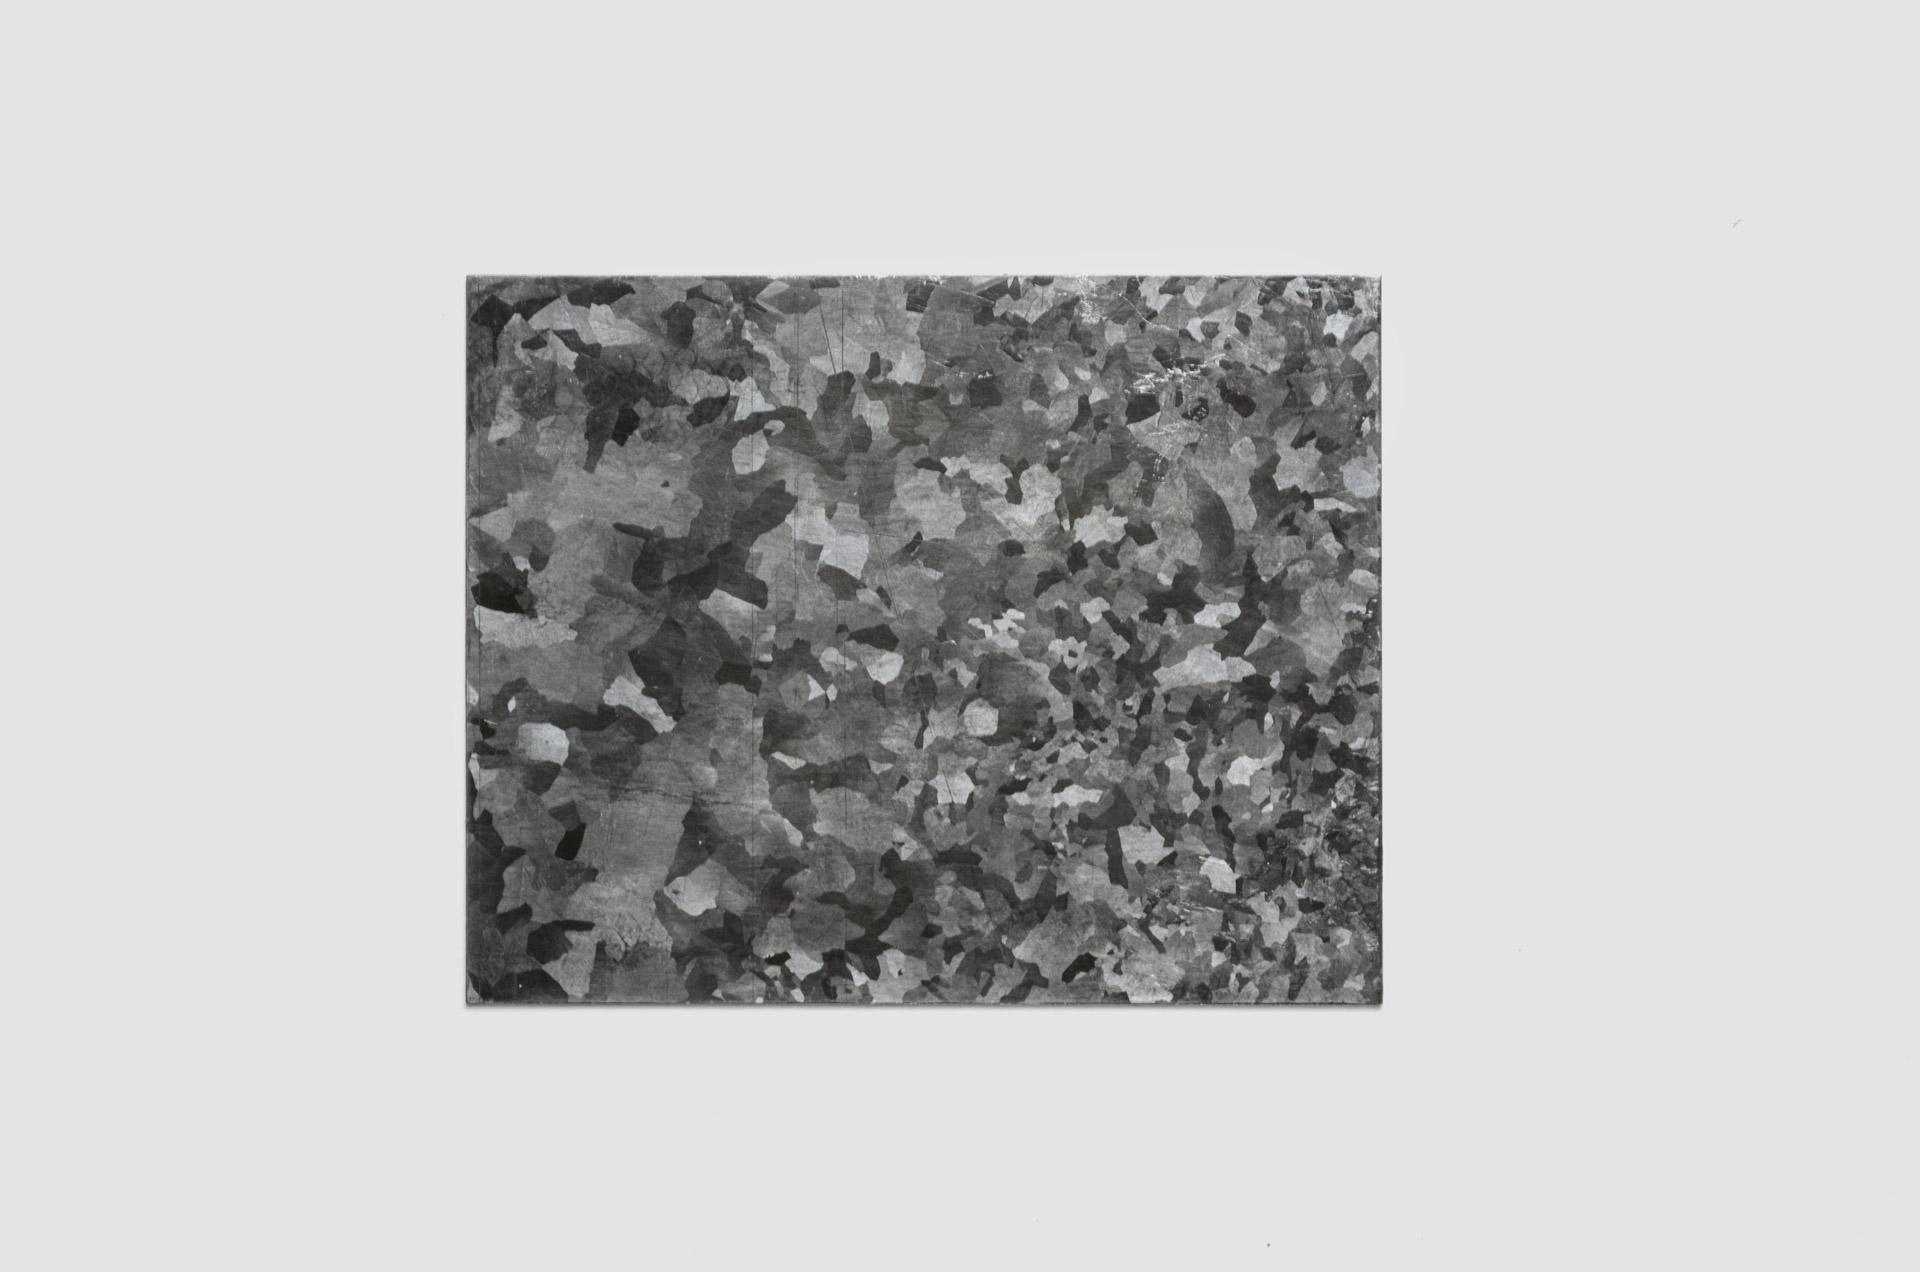 Tino Seubert - Regalvanize - Material Sample